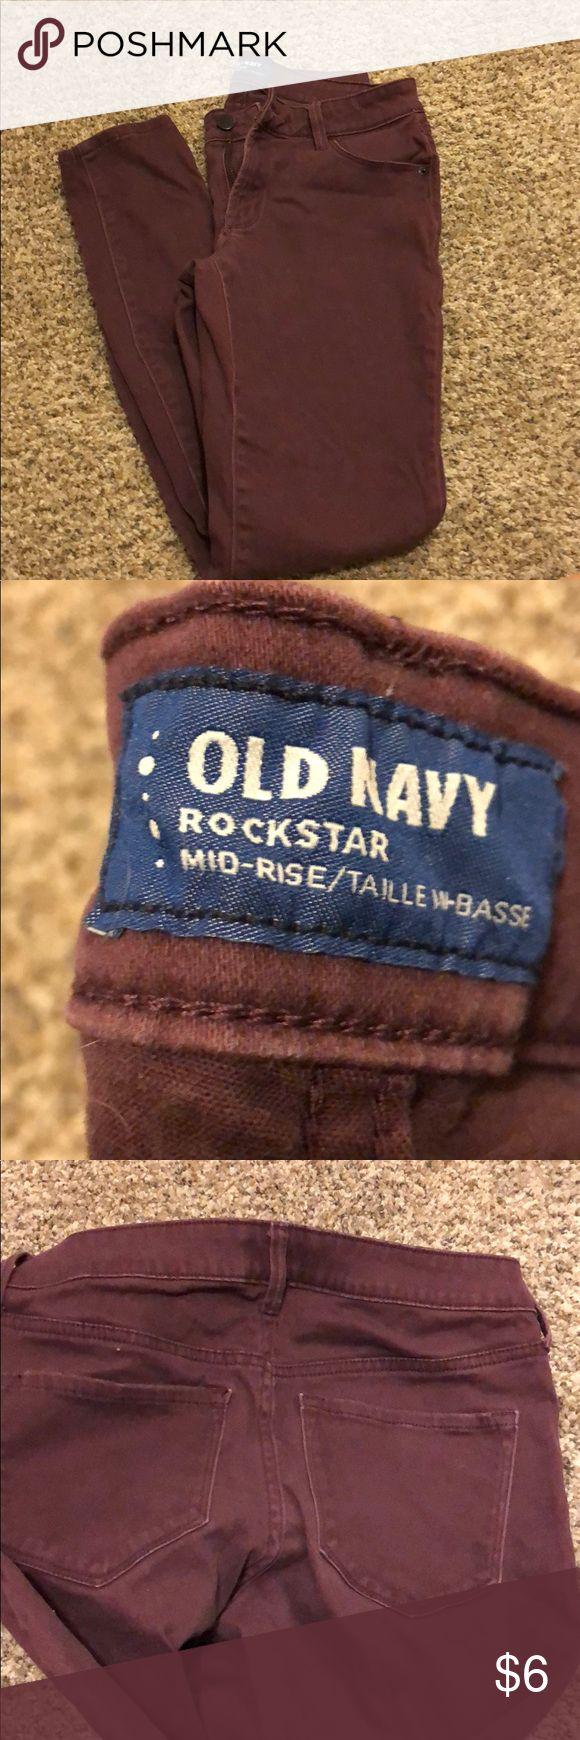 Old Navy maroon skinny jeans Maroon skinny jeans Super soft!  Size 4 Regular   Worn twice! Old Navy Jeans Skinny